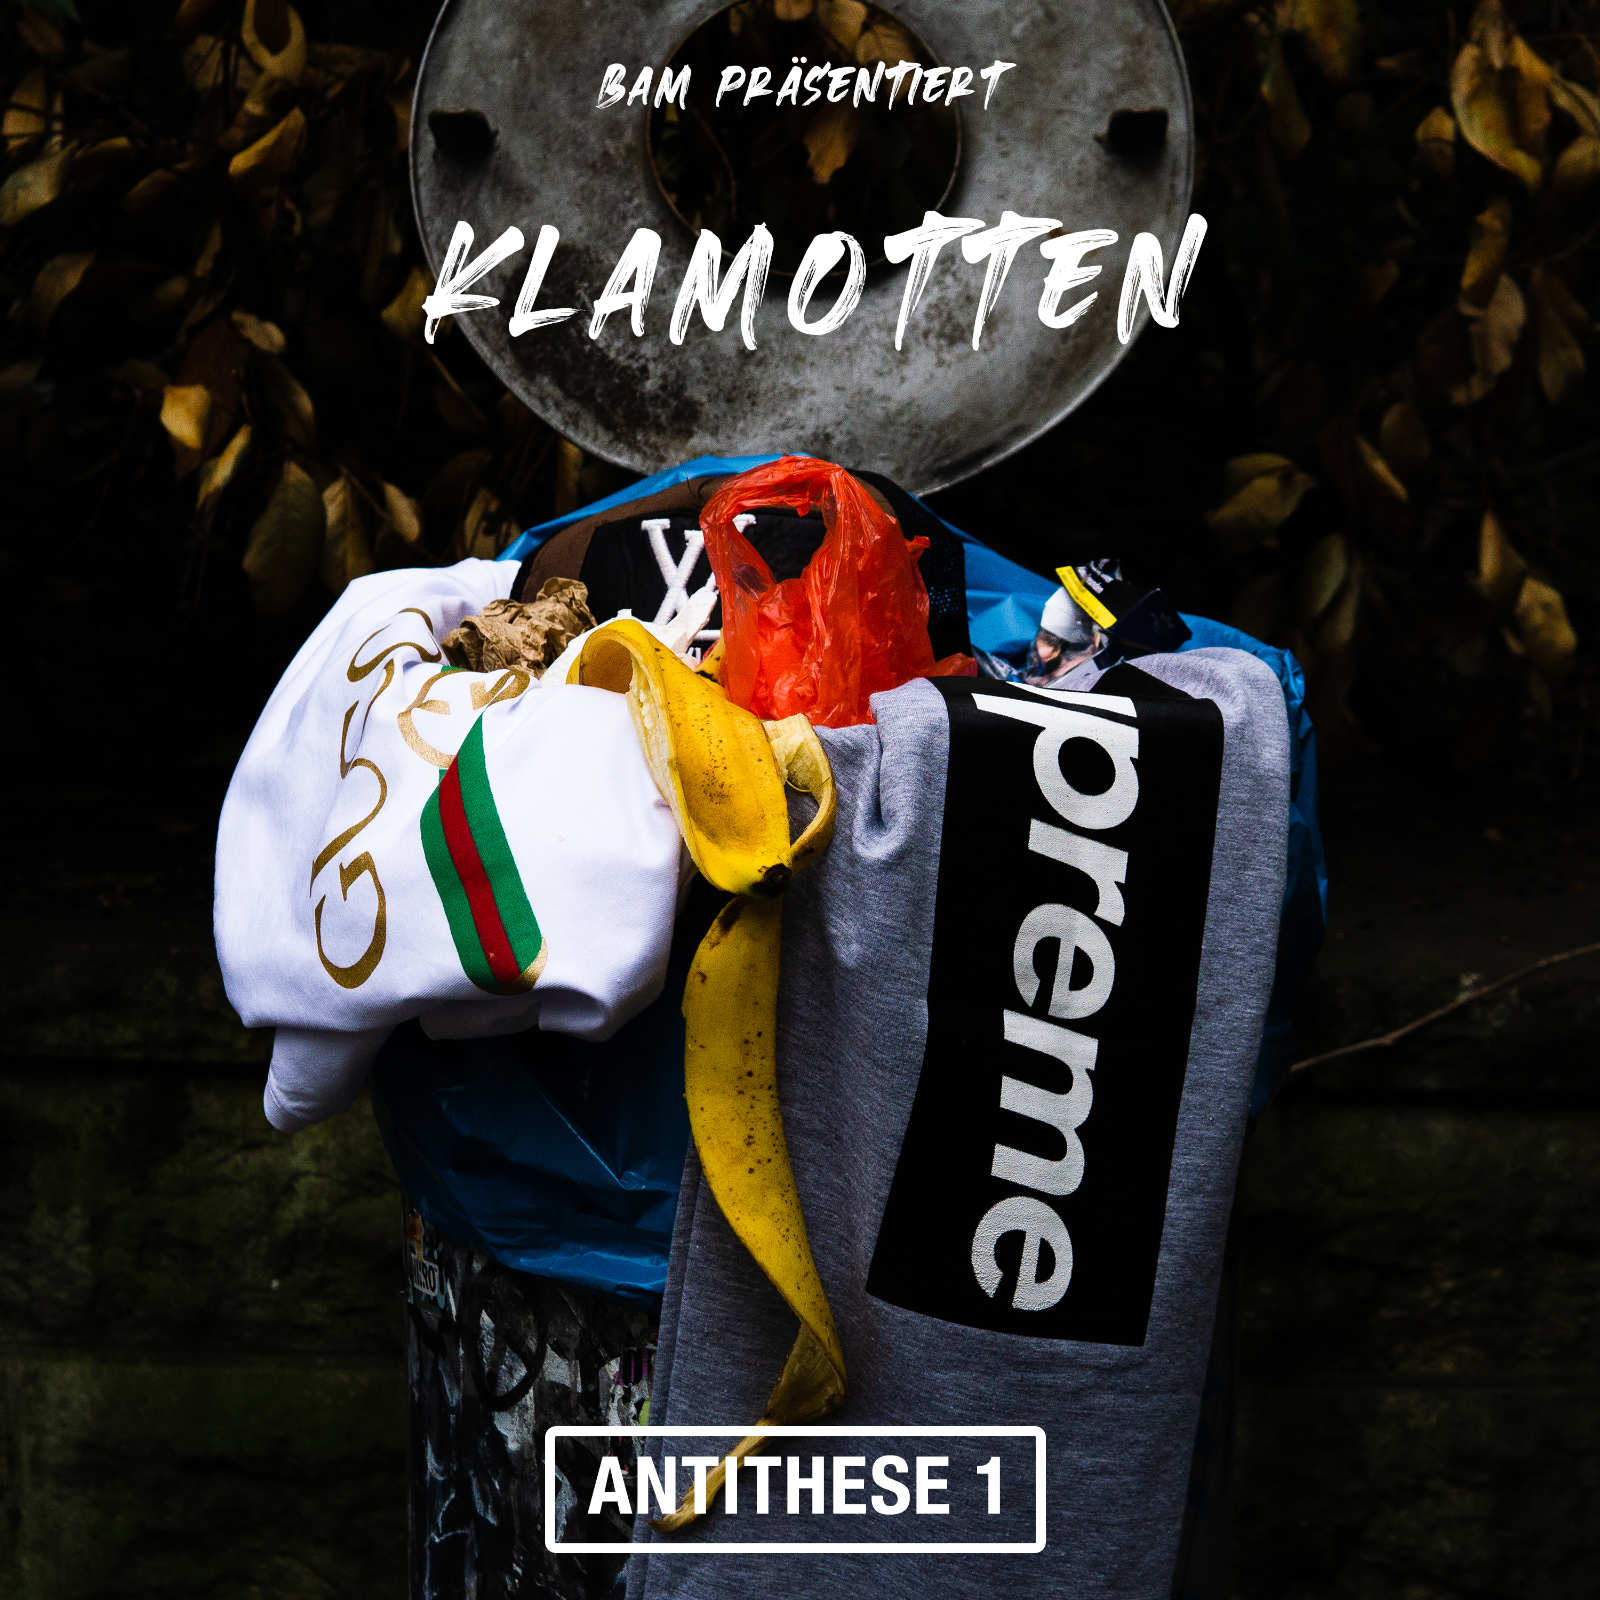 Upcoming: Bam - Klamotten (Antithese 1) Prod. By SiAR